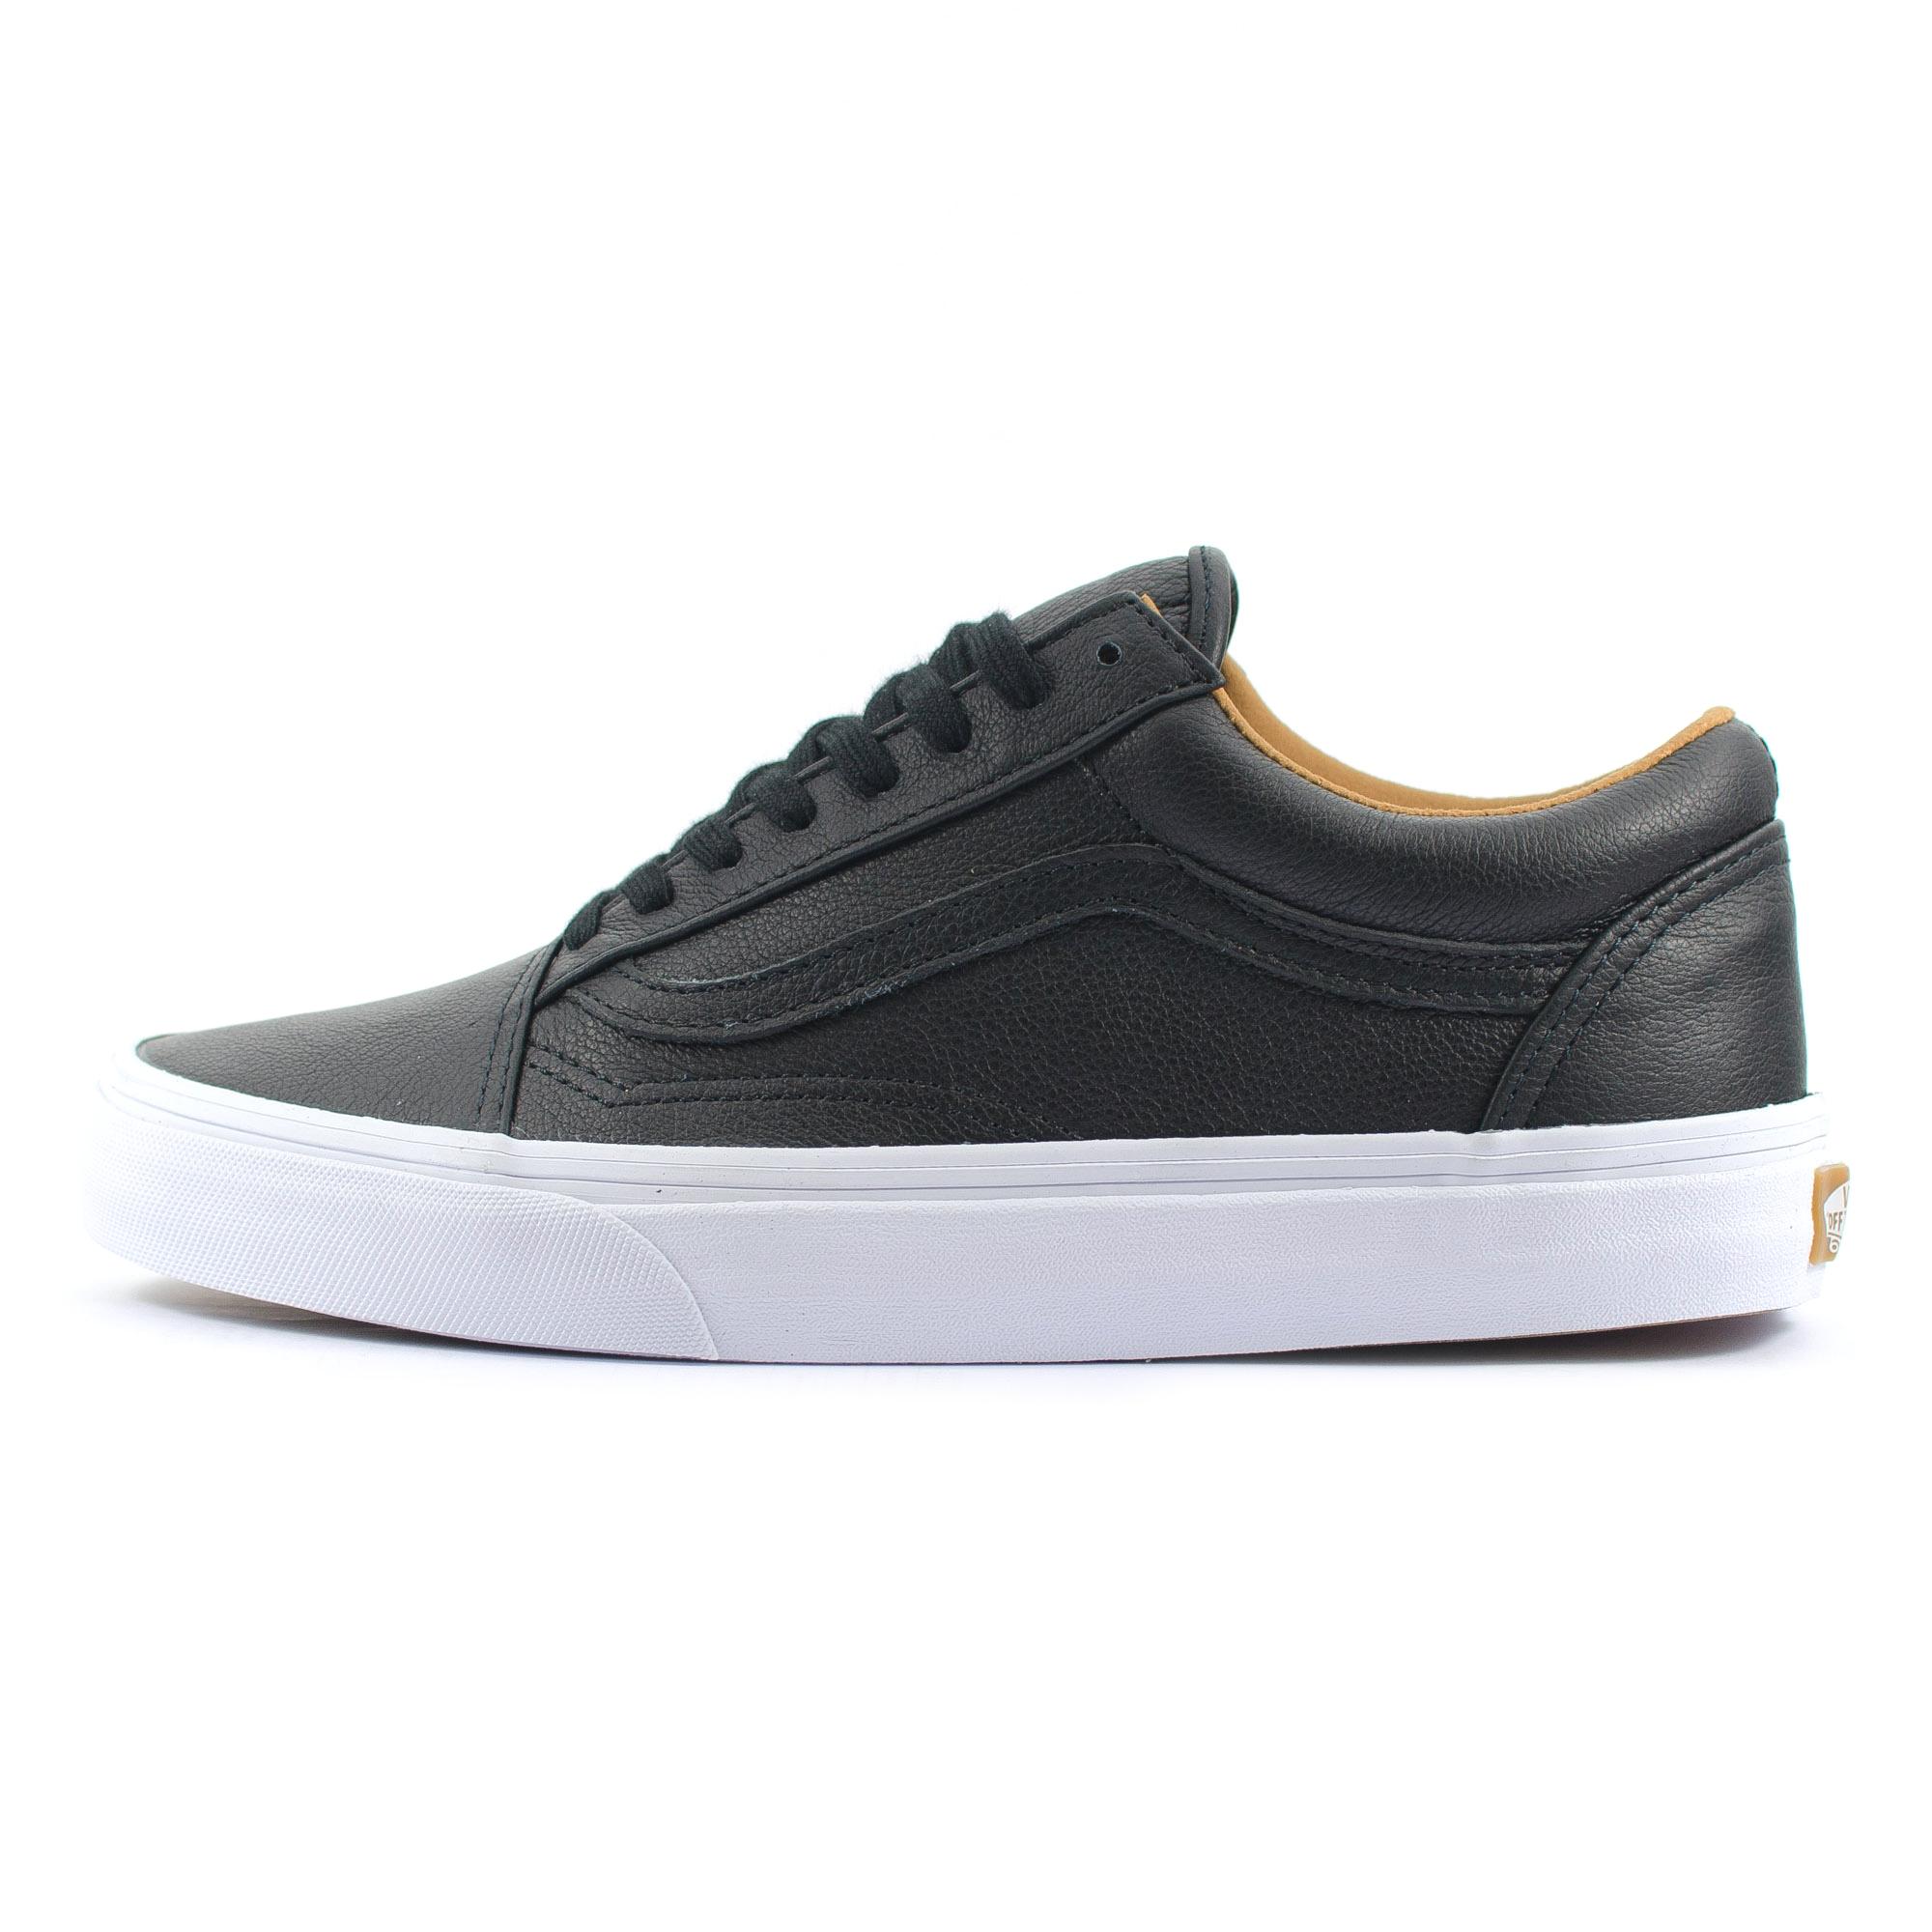 unisex vans old skool skate premium leather black classic. Black Bedroom Furniture Sets. Home Design Ideas